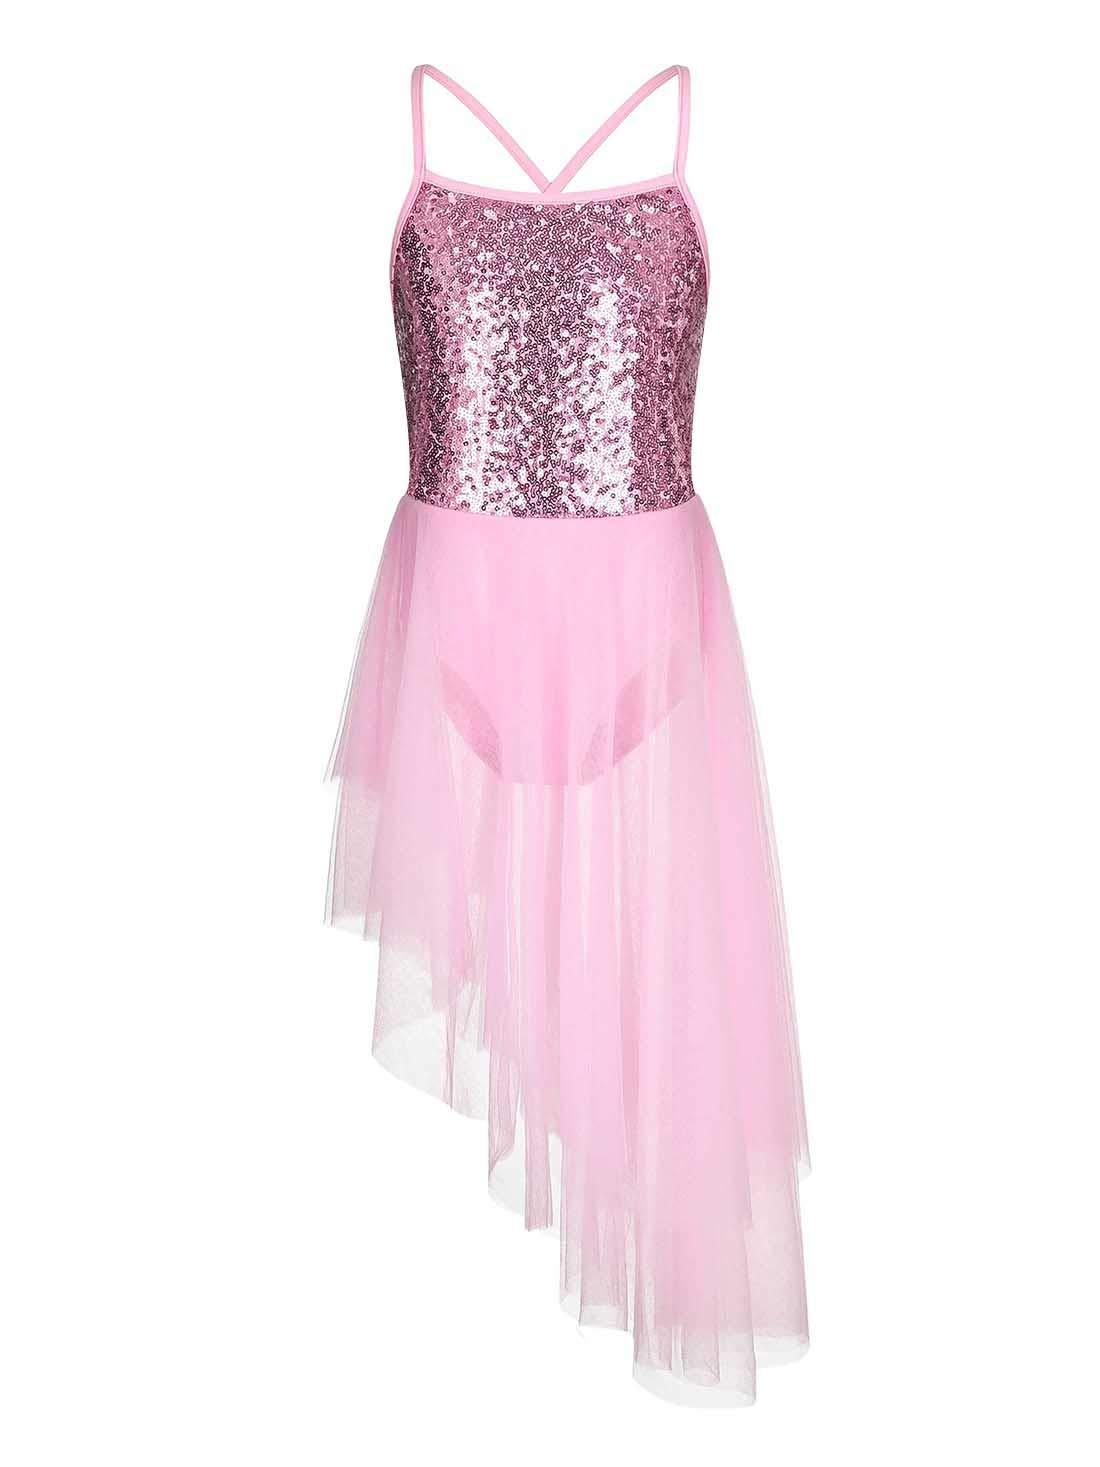 FONLAM Dance Leotard Ballerina Dress Sequined Camisole Ballet Tutu Dress for Girl Kid